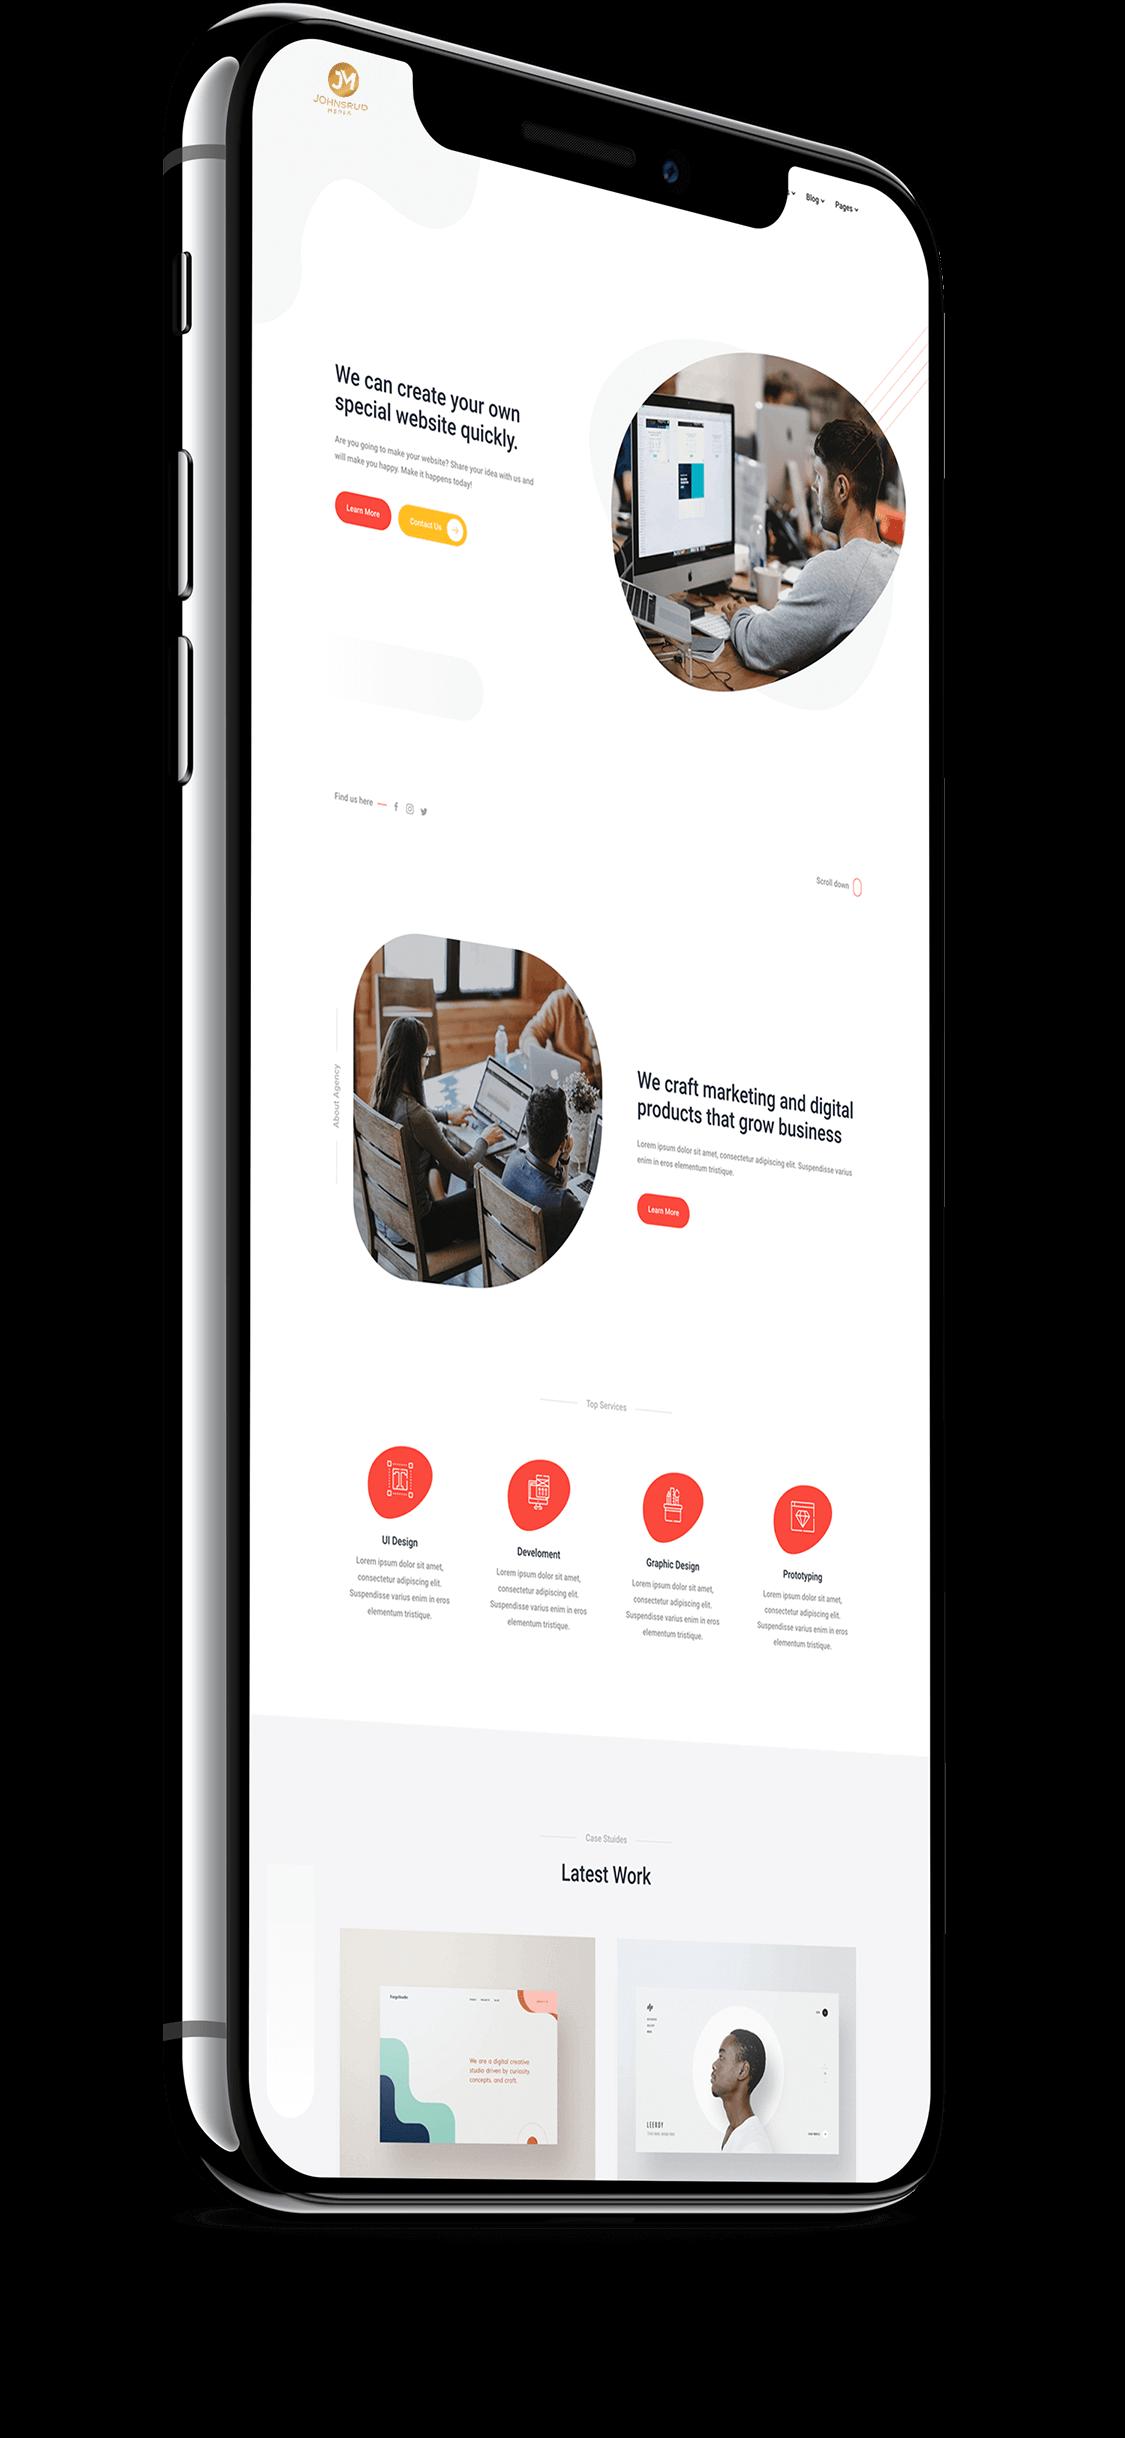 Web design - image